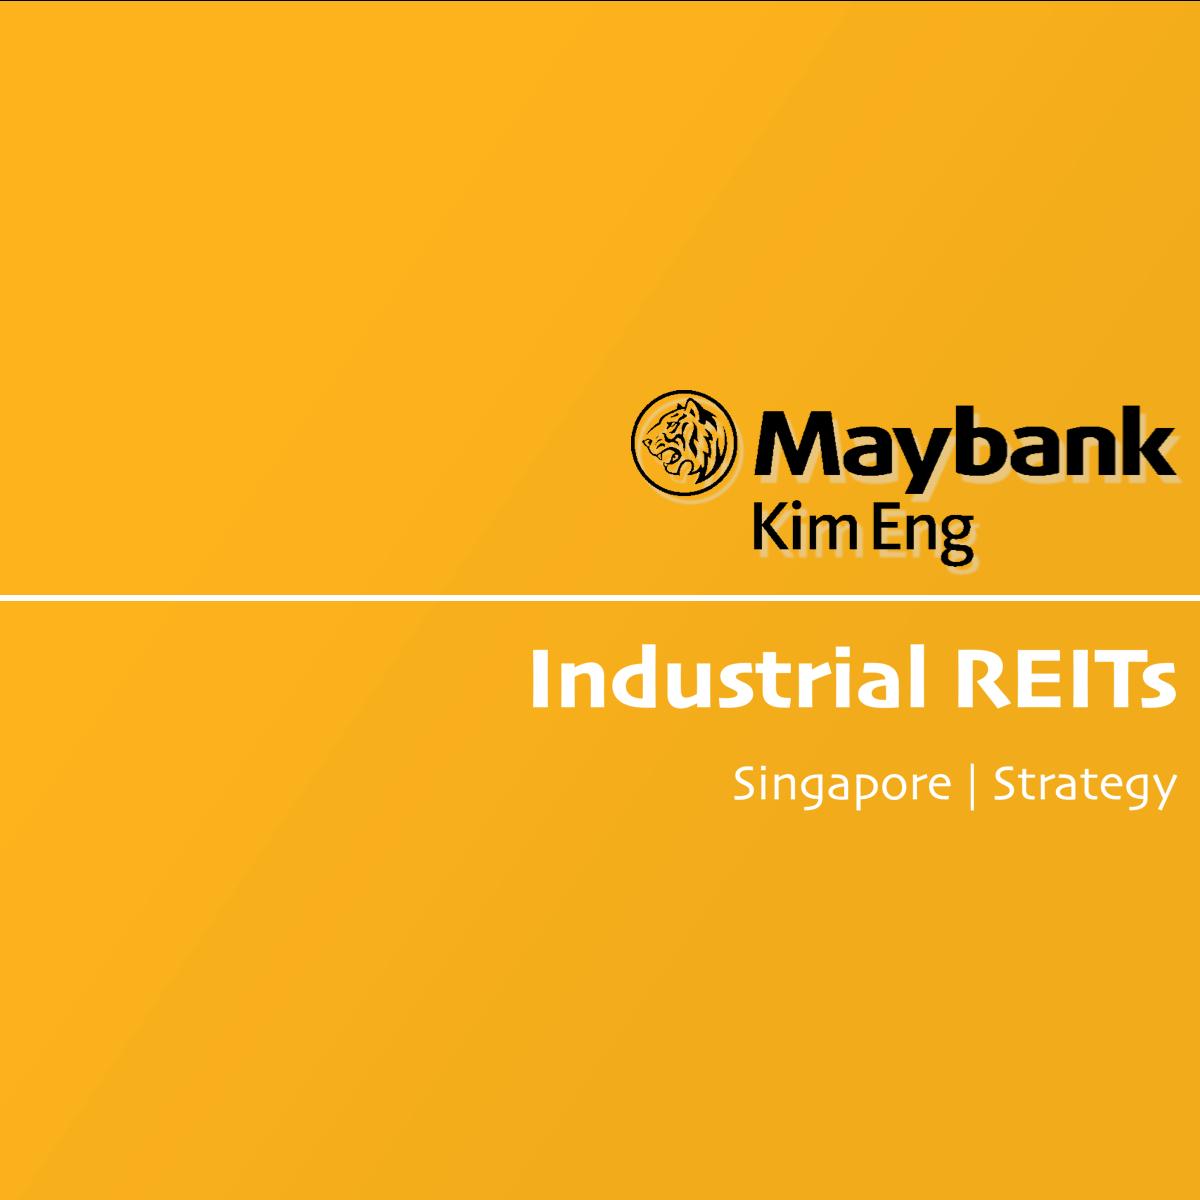 Industrial REITs - Maybank Kim Eng Research | SGinvestors.io